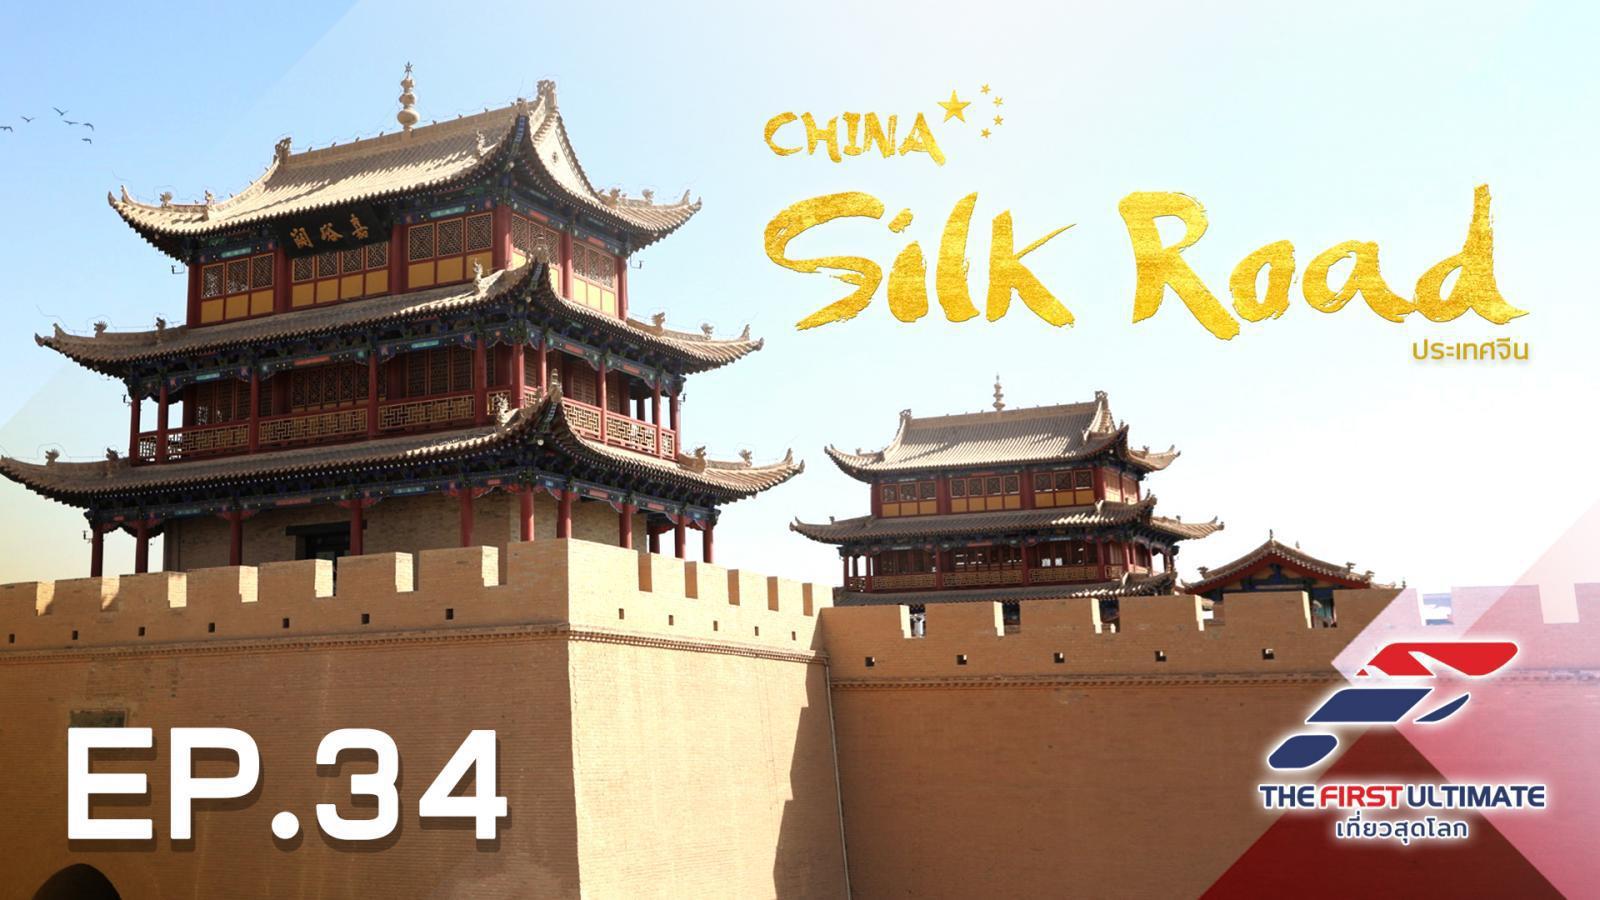 China Silk Road ตอน 2